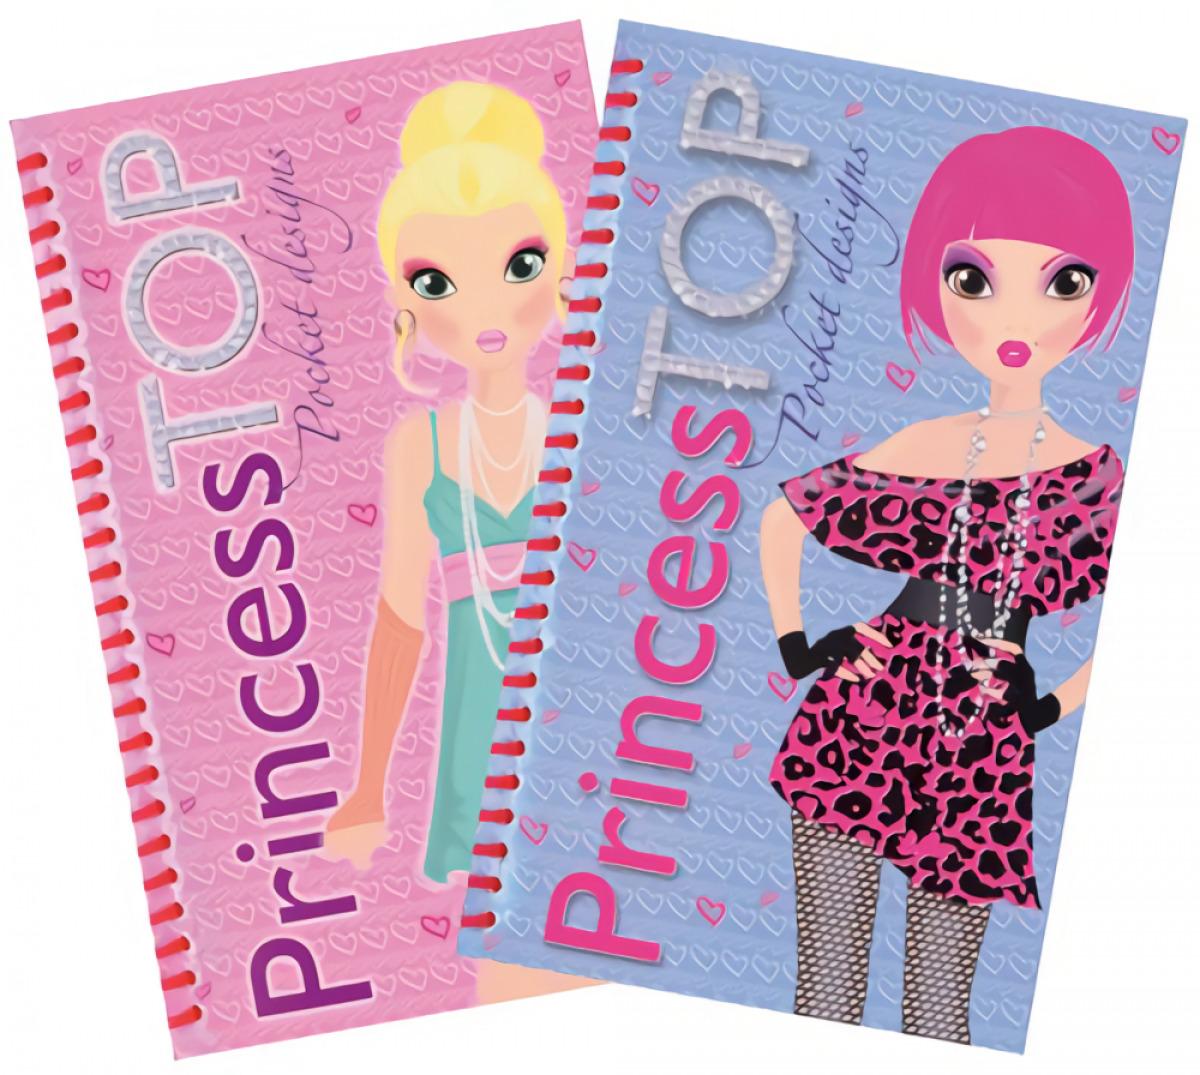 Princess top - pocket designs - Vv.Aa.